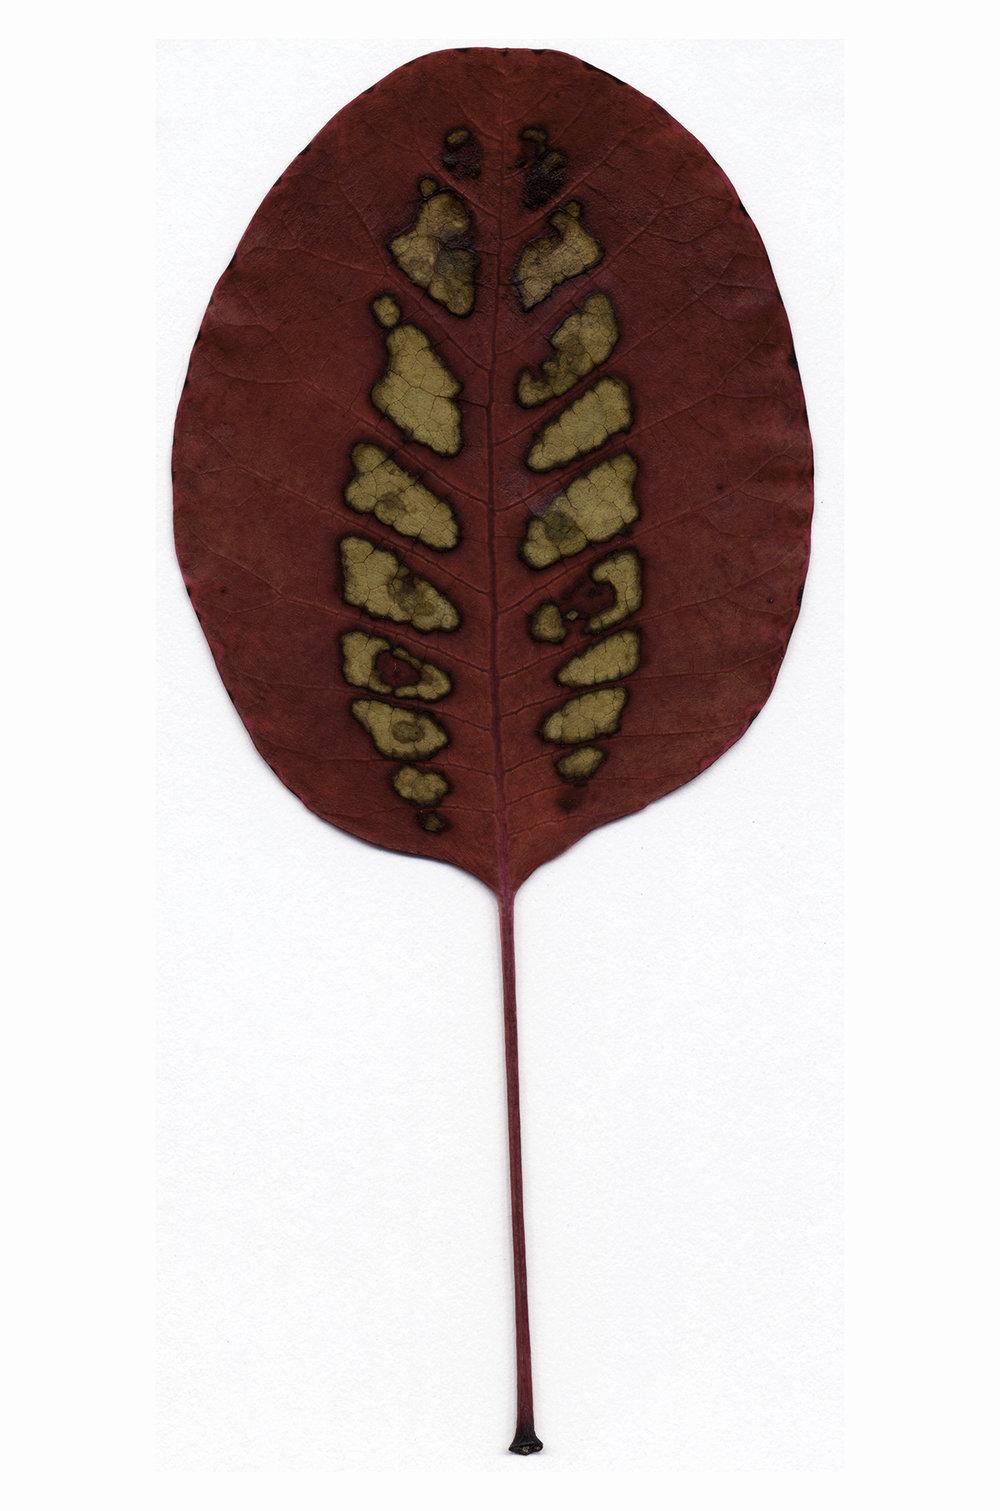 Feather Leaf - Smoke tree33-Edit.jpg